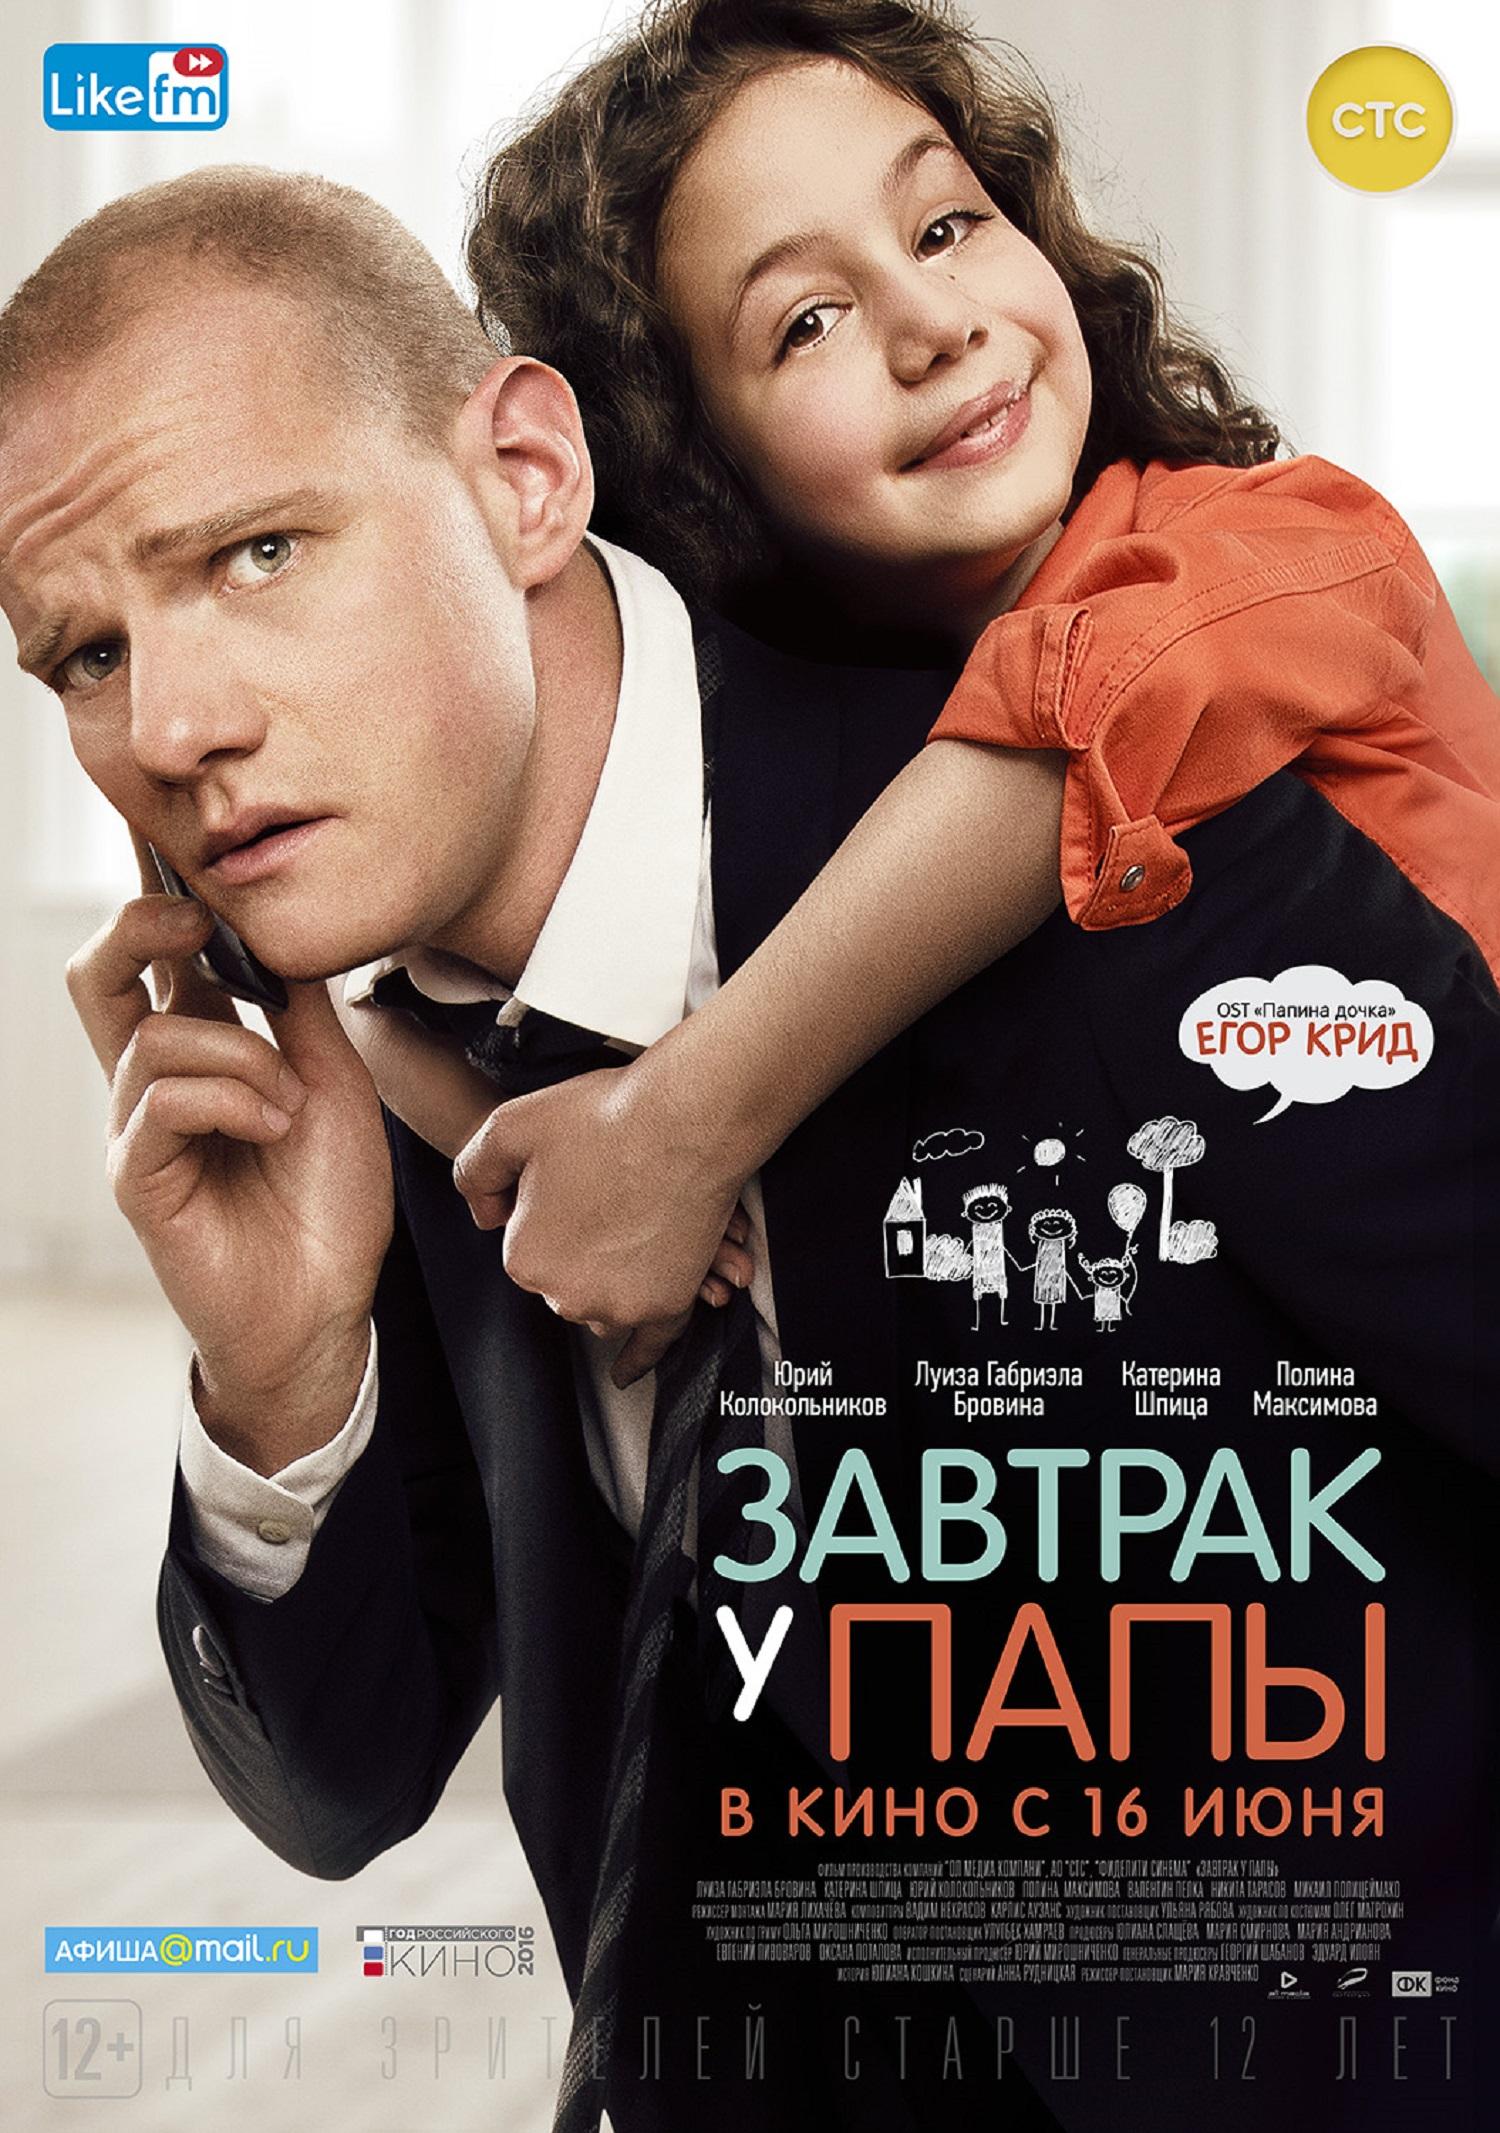 Yuri Tarasov - a talented Russian film actor 6